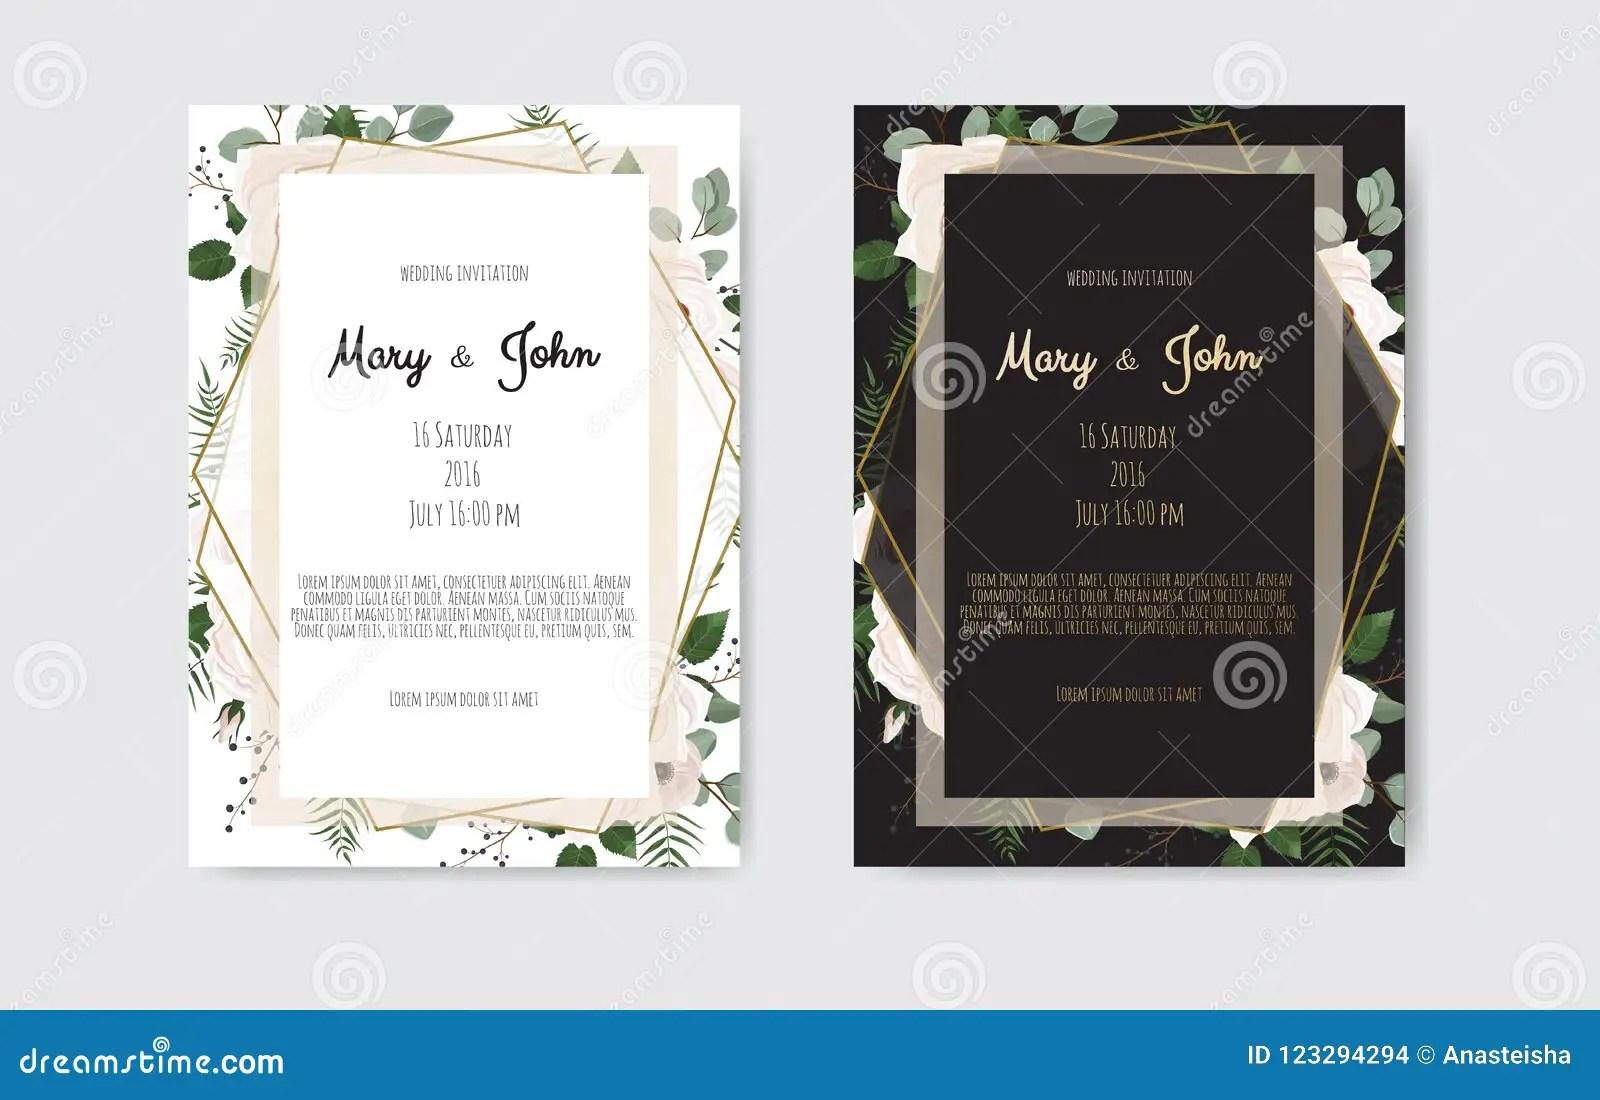 https www dreamstime com botanical wedding invitation card template design white pink flowers black background image123294294